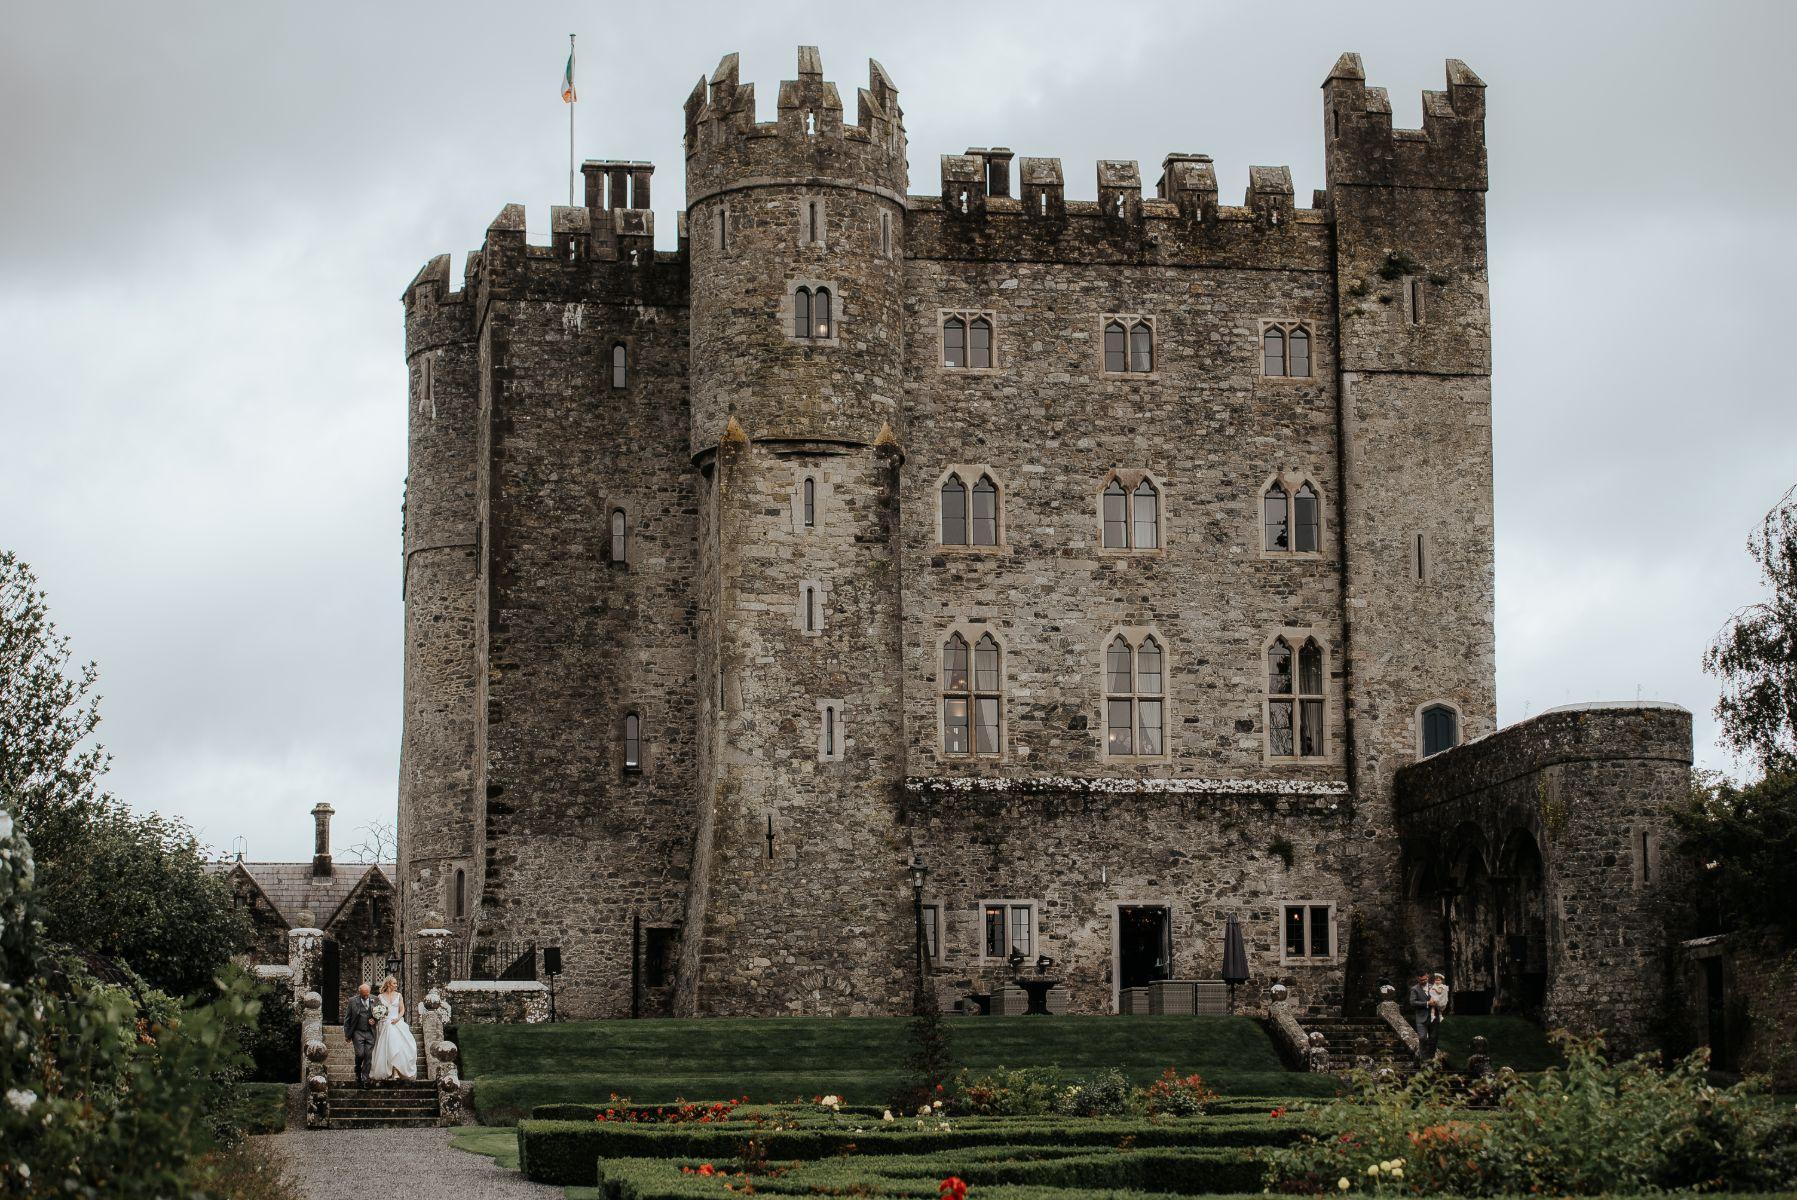 Castle in Ireland prior to hosting a wedding celebration.